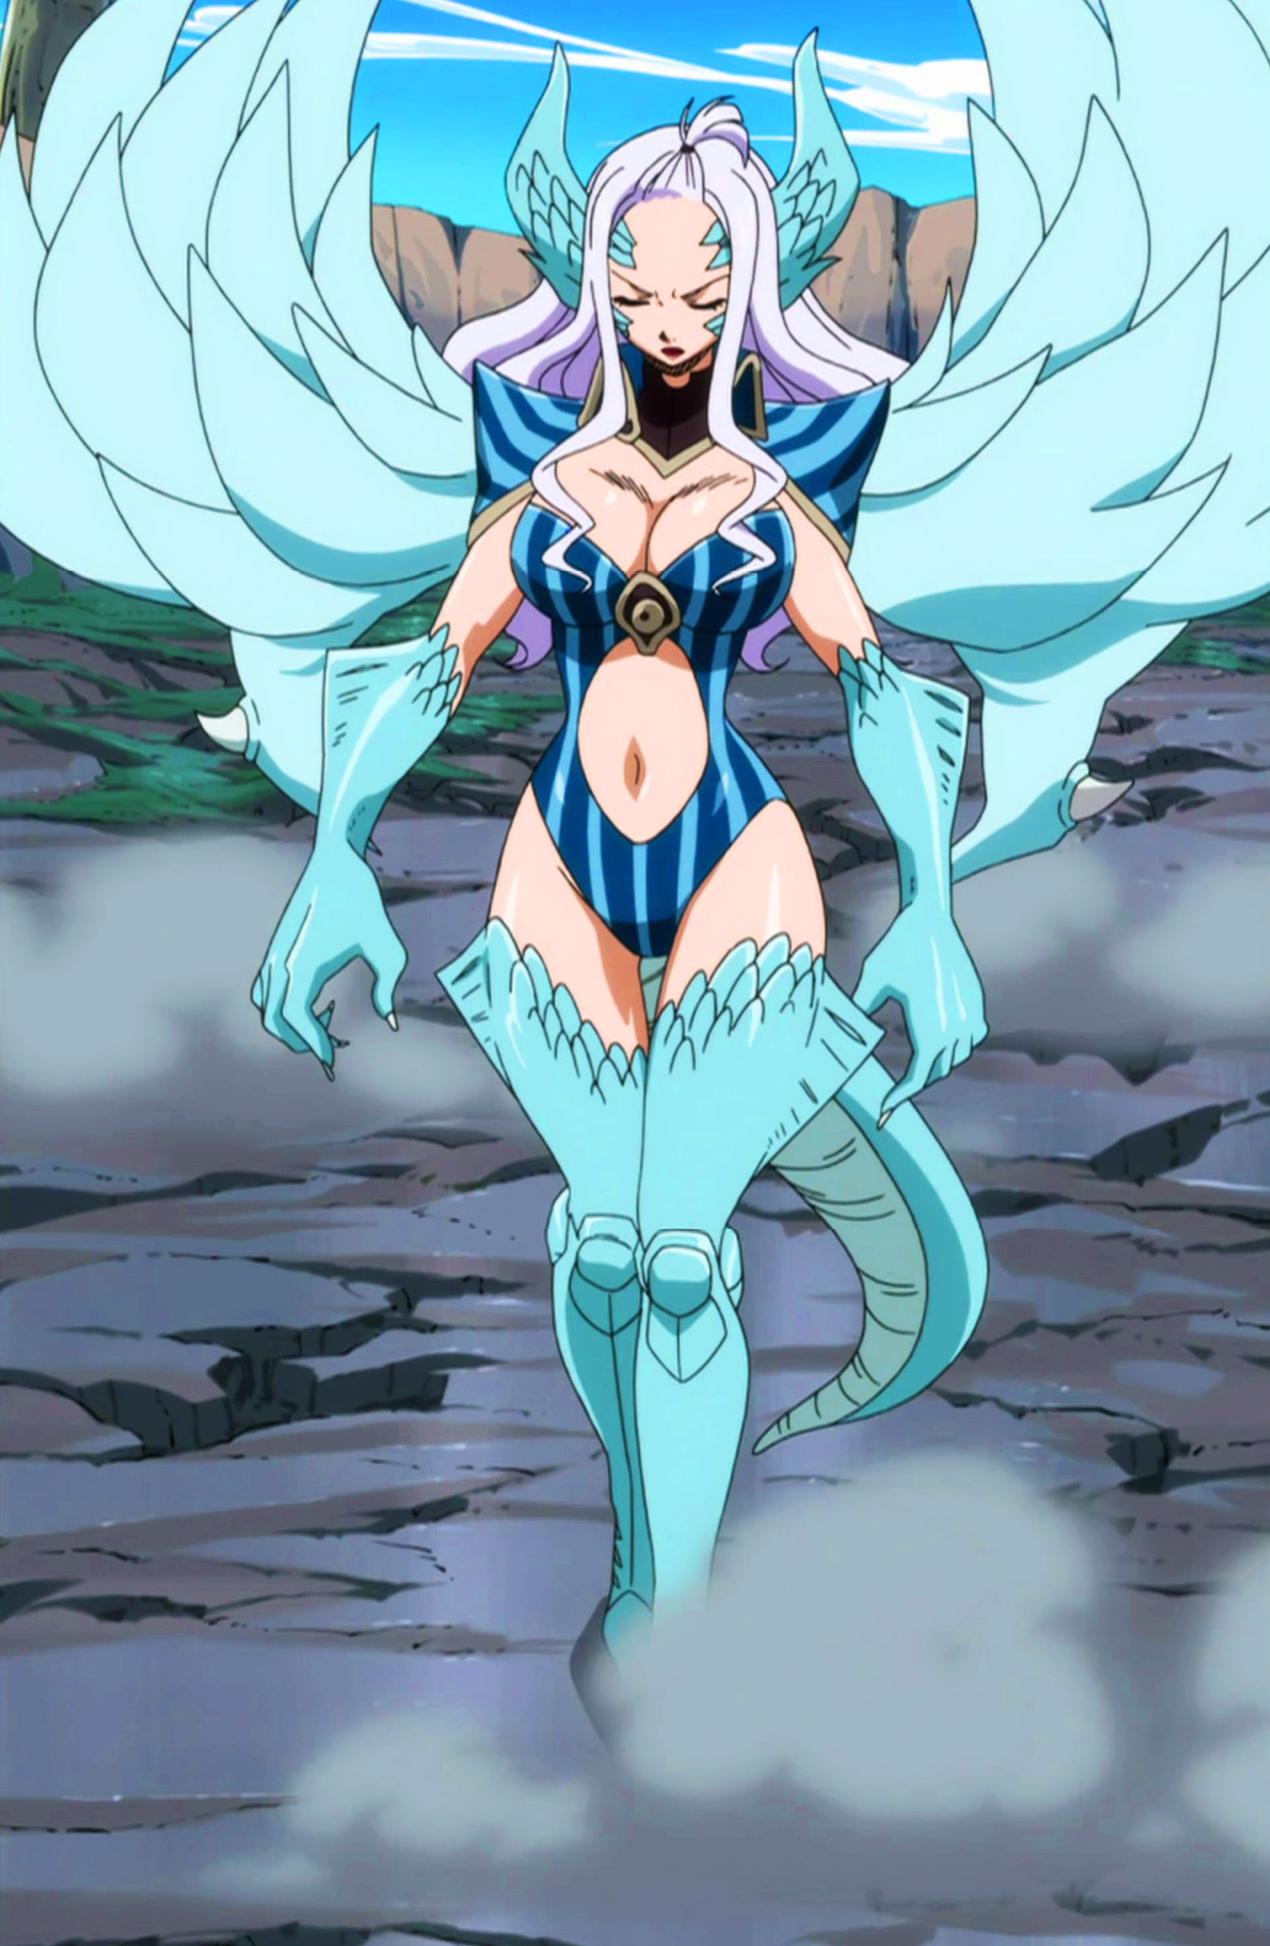 Mirajane Strauss Fairy Tale Anime Fairy Tail Girls Fairy Tail Anime 750 x 1334 jpeg 97 кб. fairy tale anime fairy tail girls